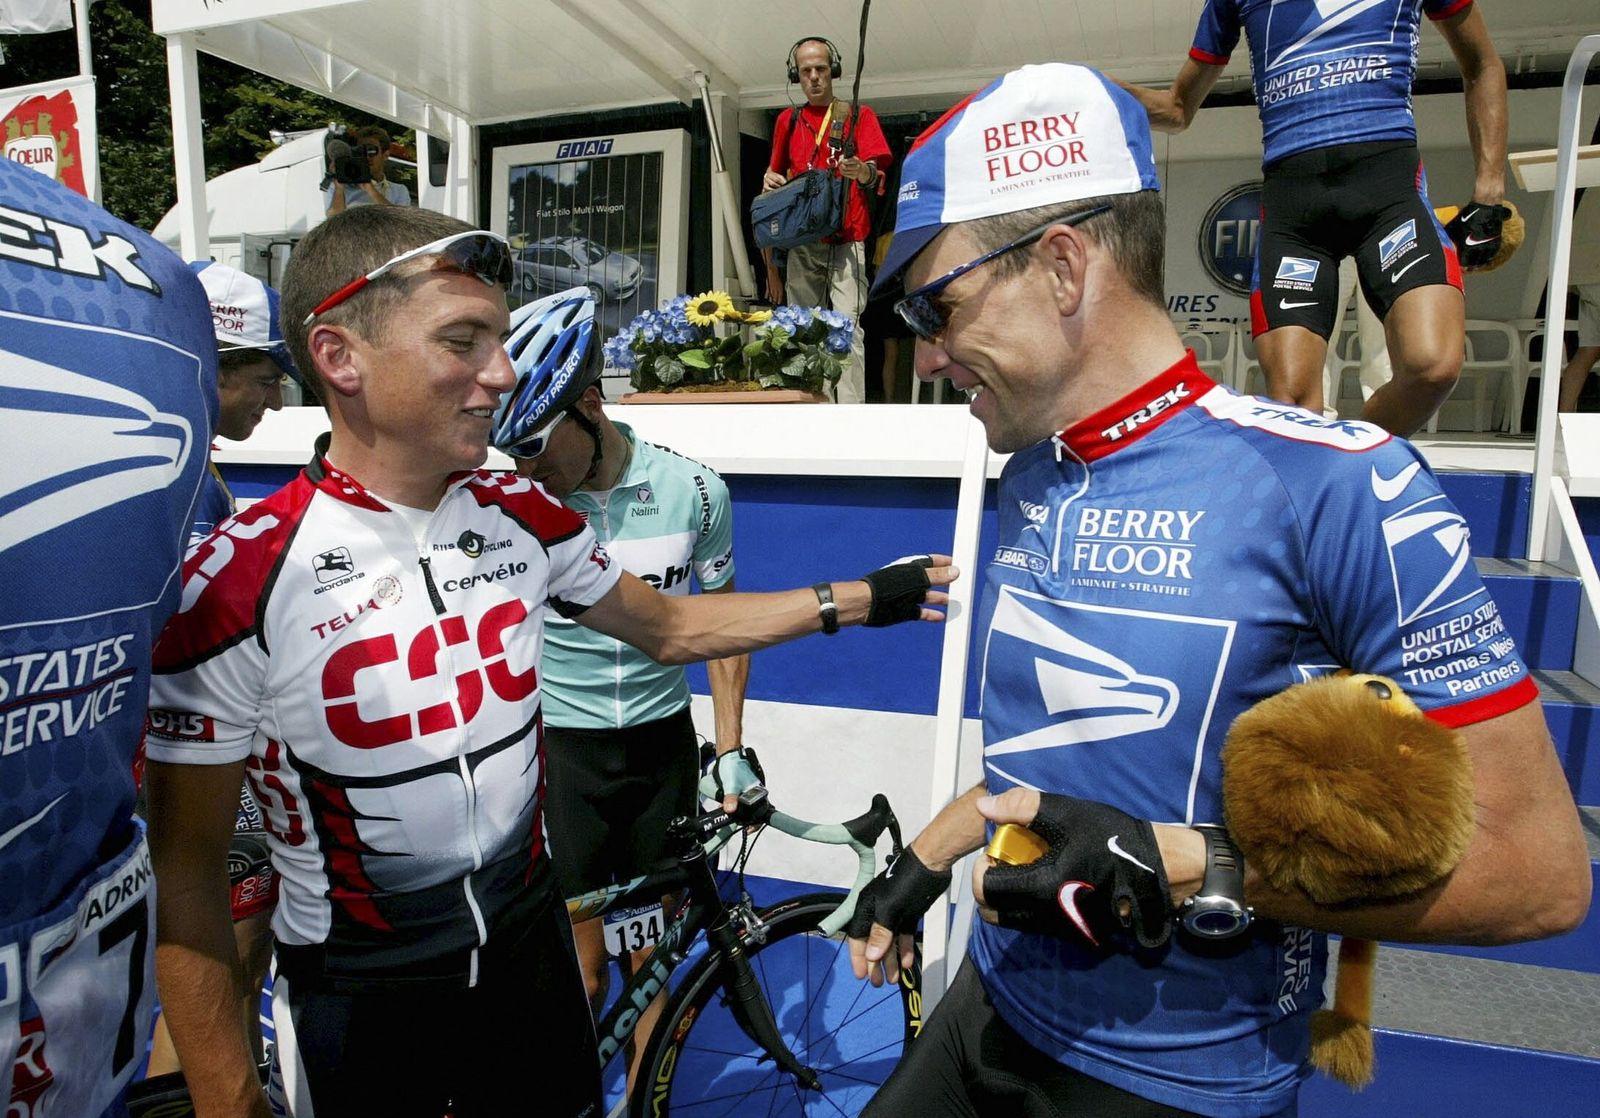 Lance Armstrong/Tyler Hamilton